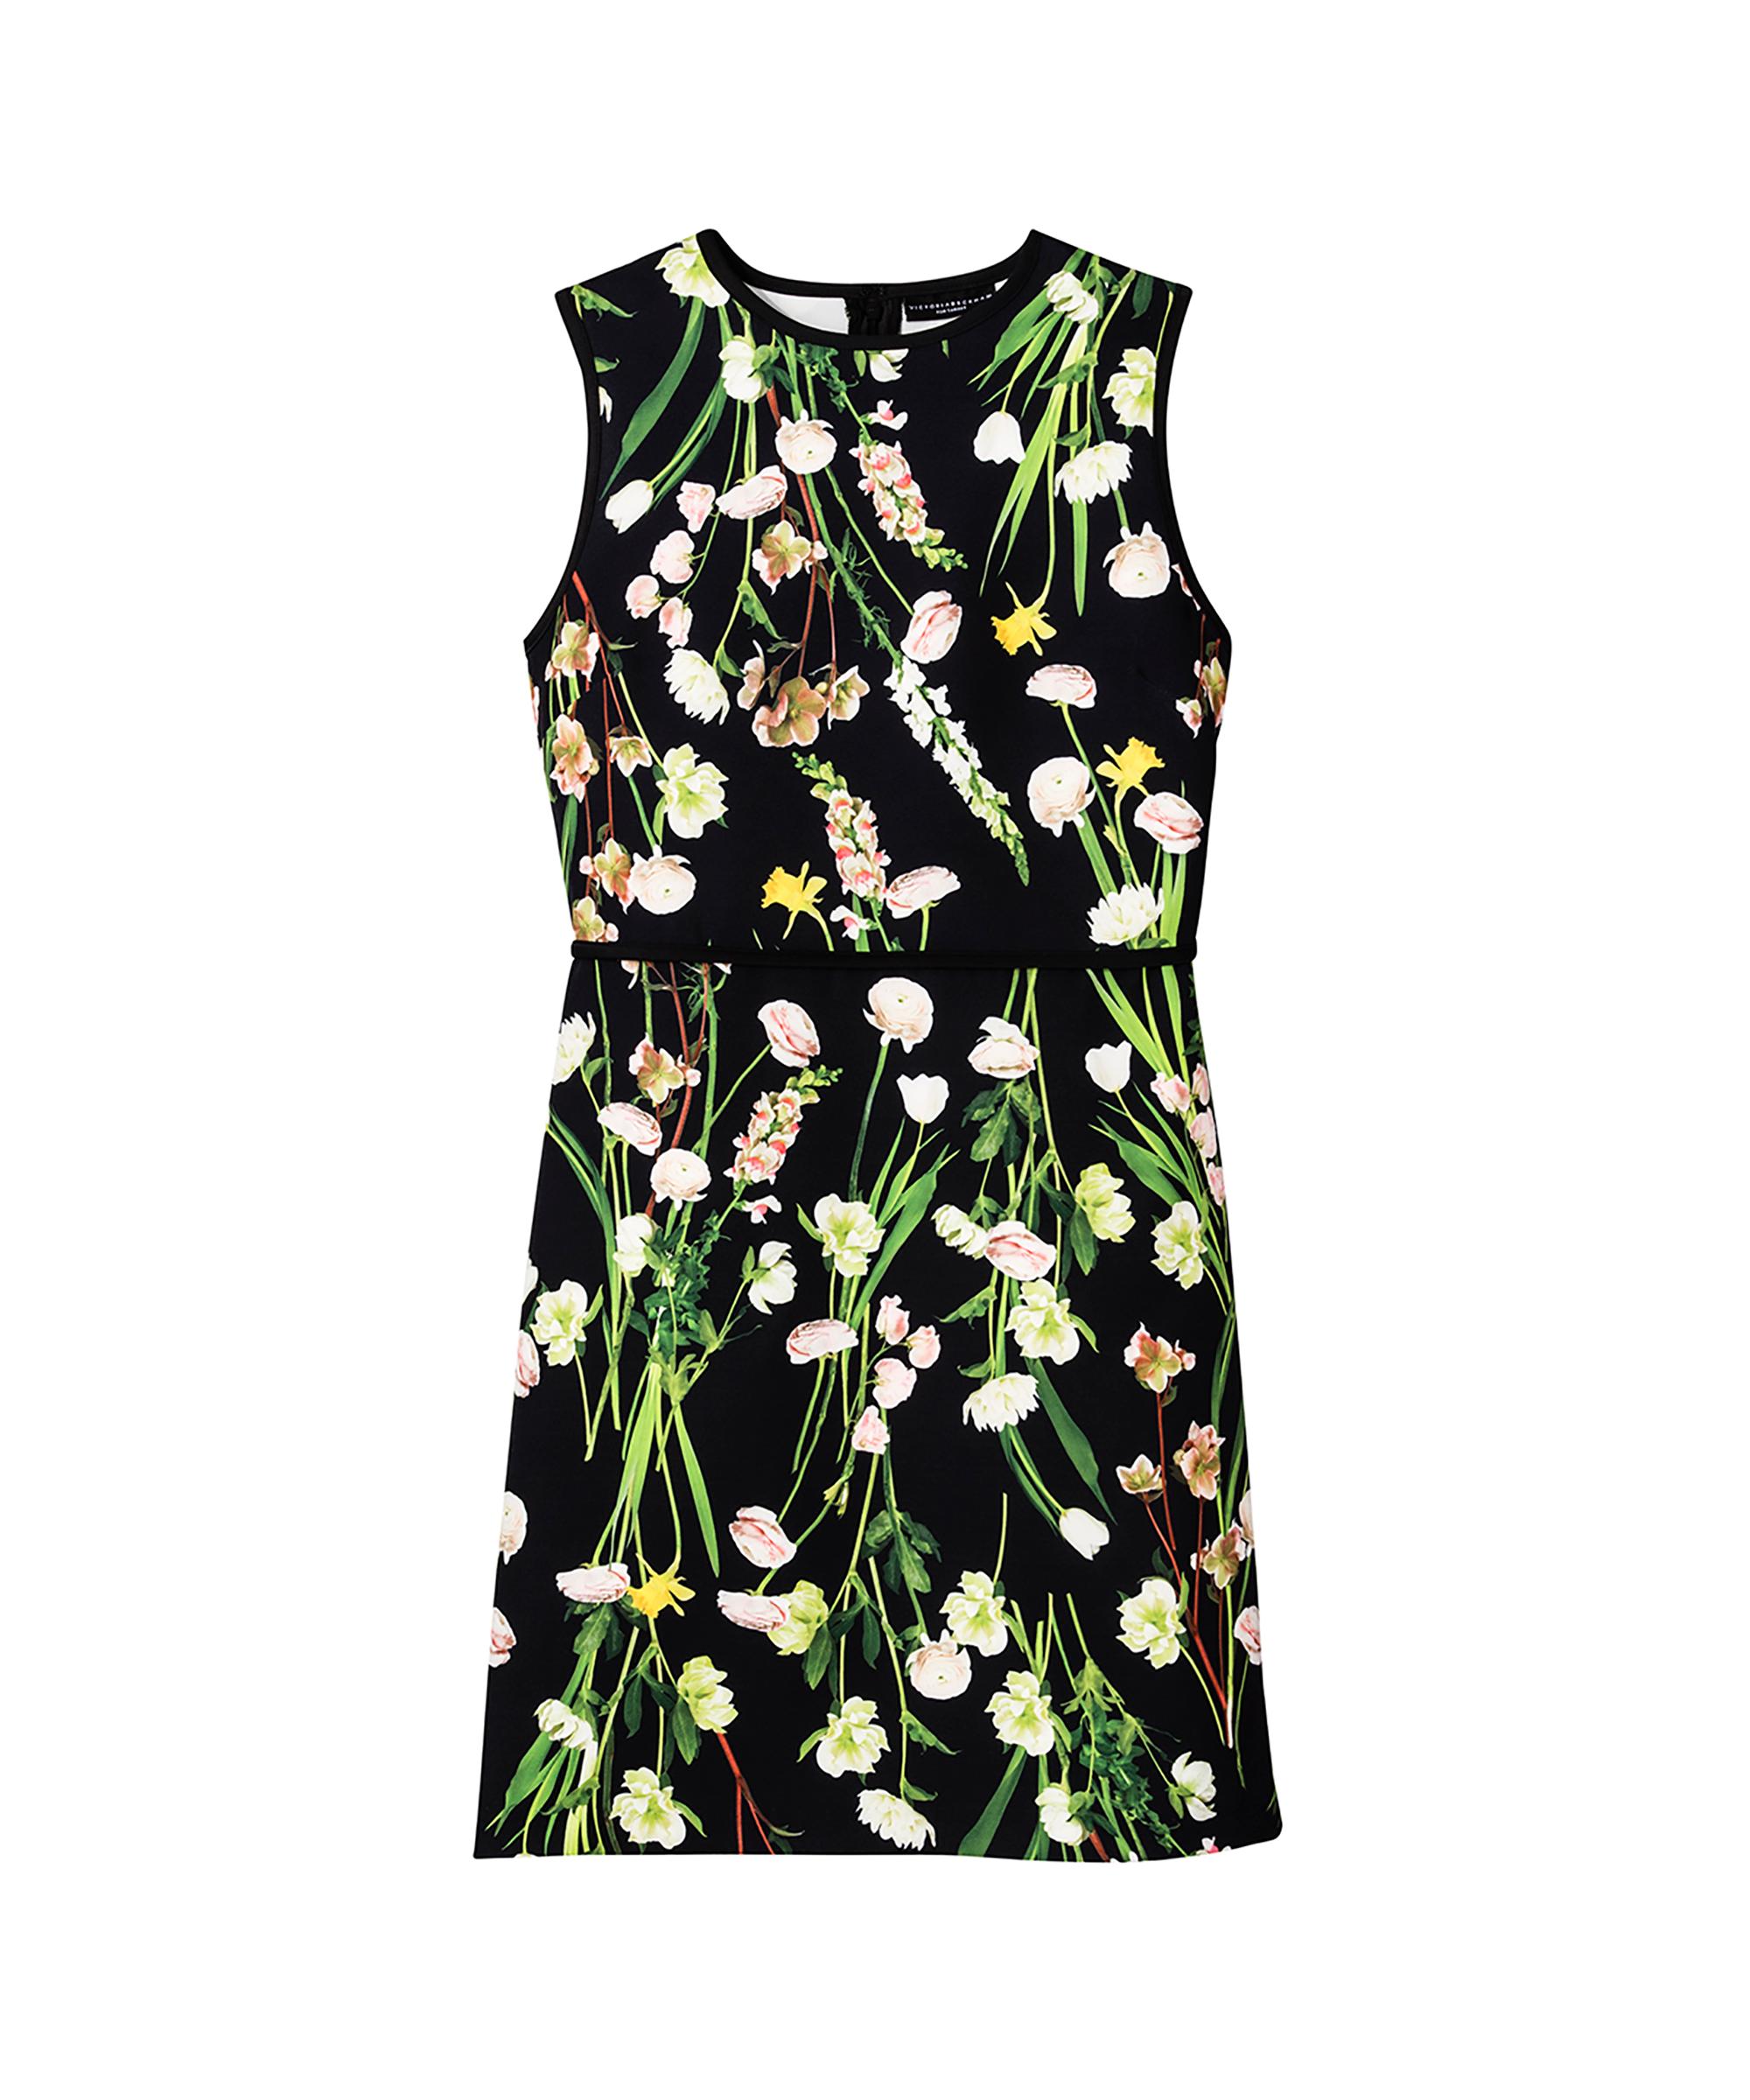 e407cee905 Target Sale Victoria Beckham Clothing Line Discounts